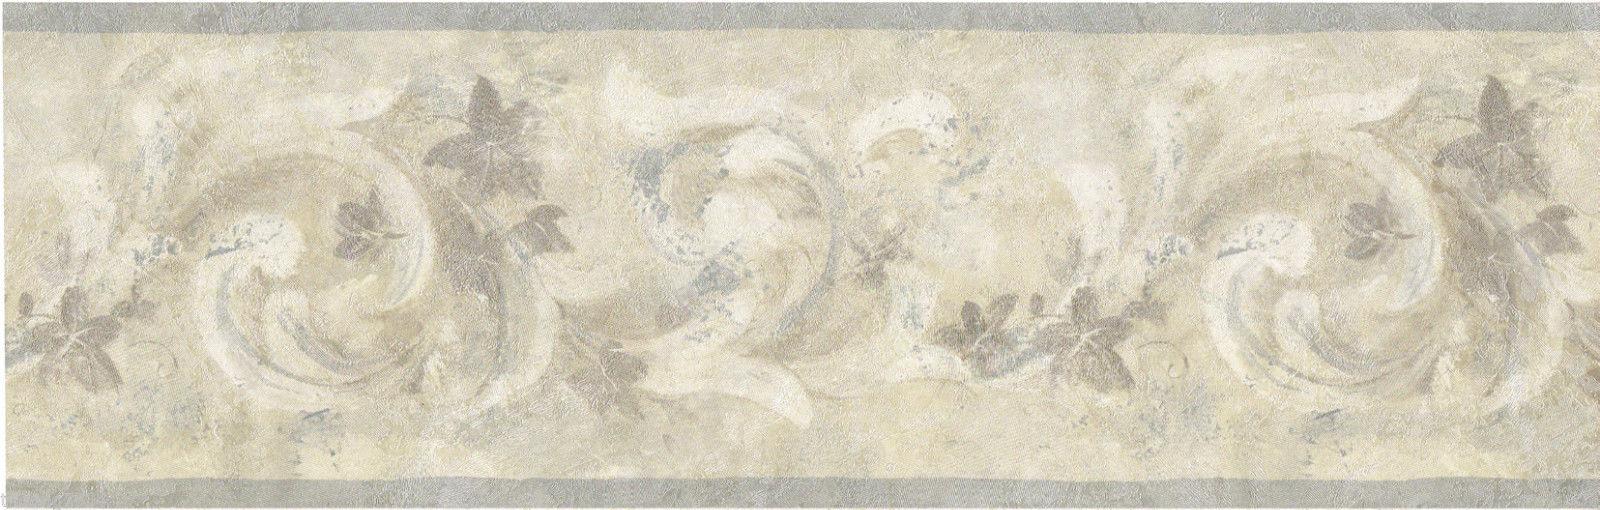 Silver Gray Blue Cream Sachet Scroll Leaf Leaves Wall paper Border 1600x510